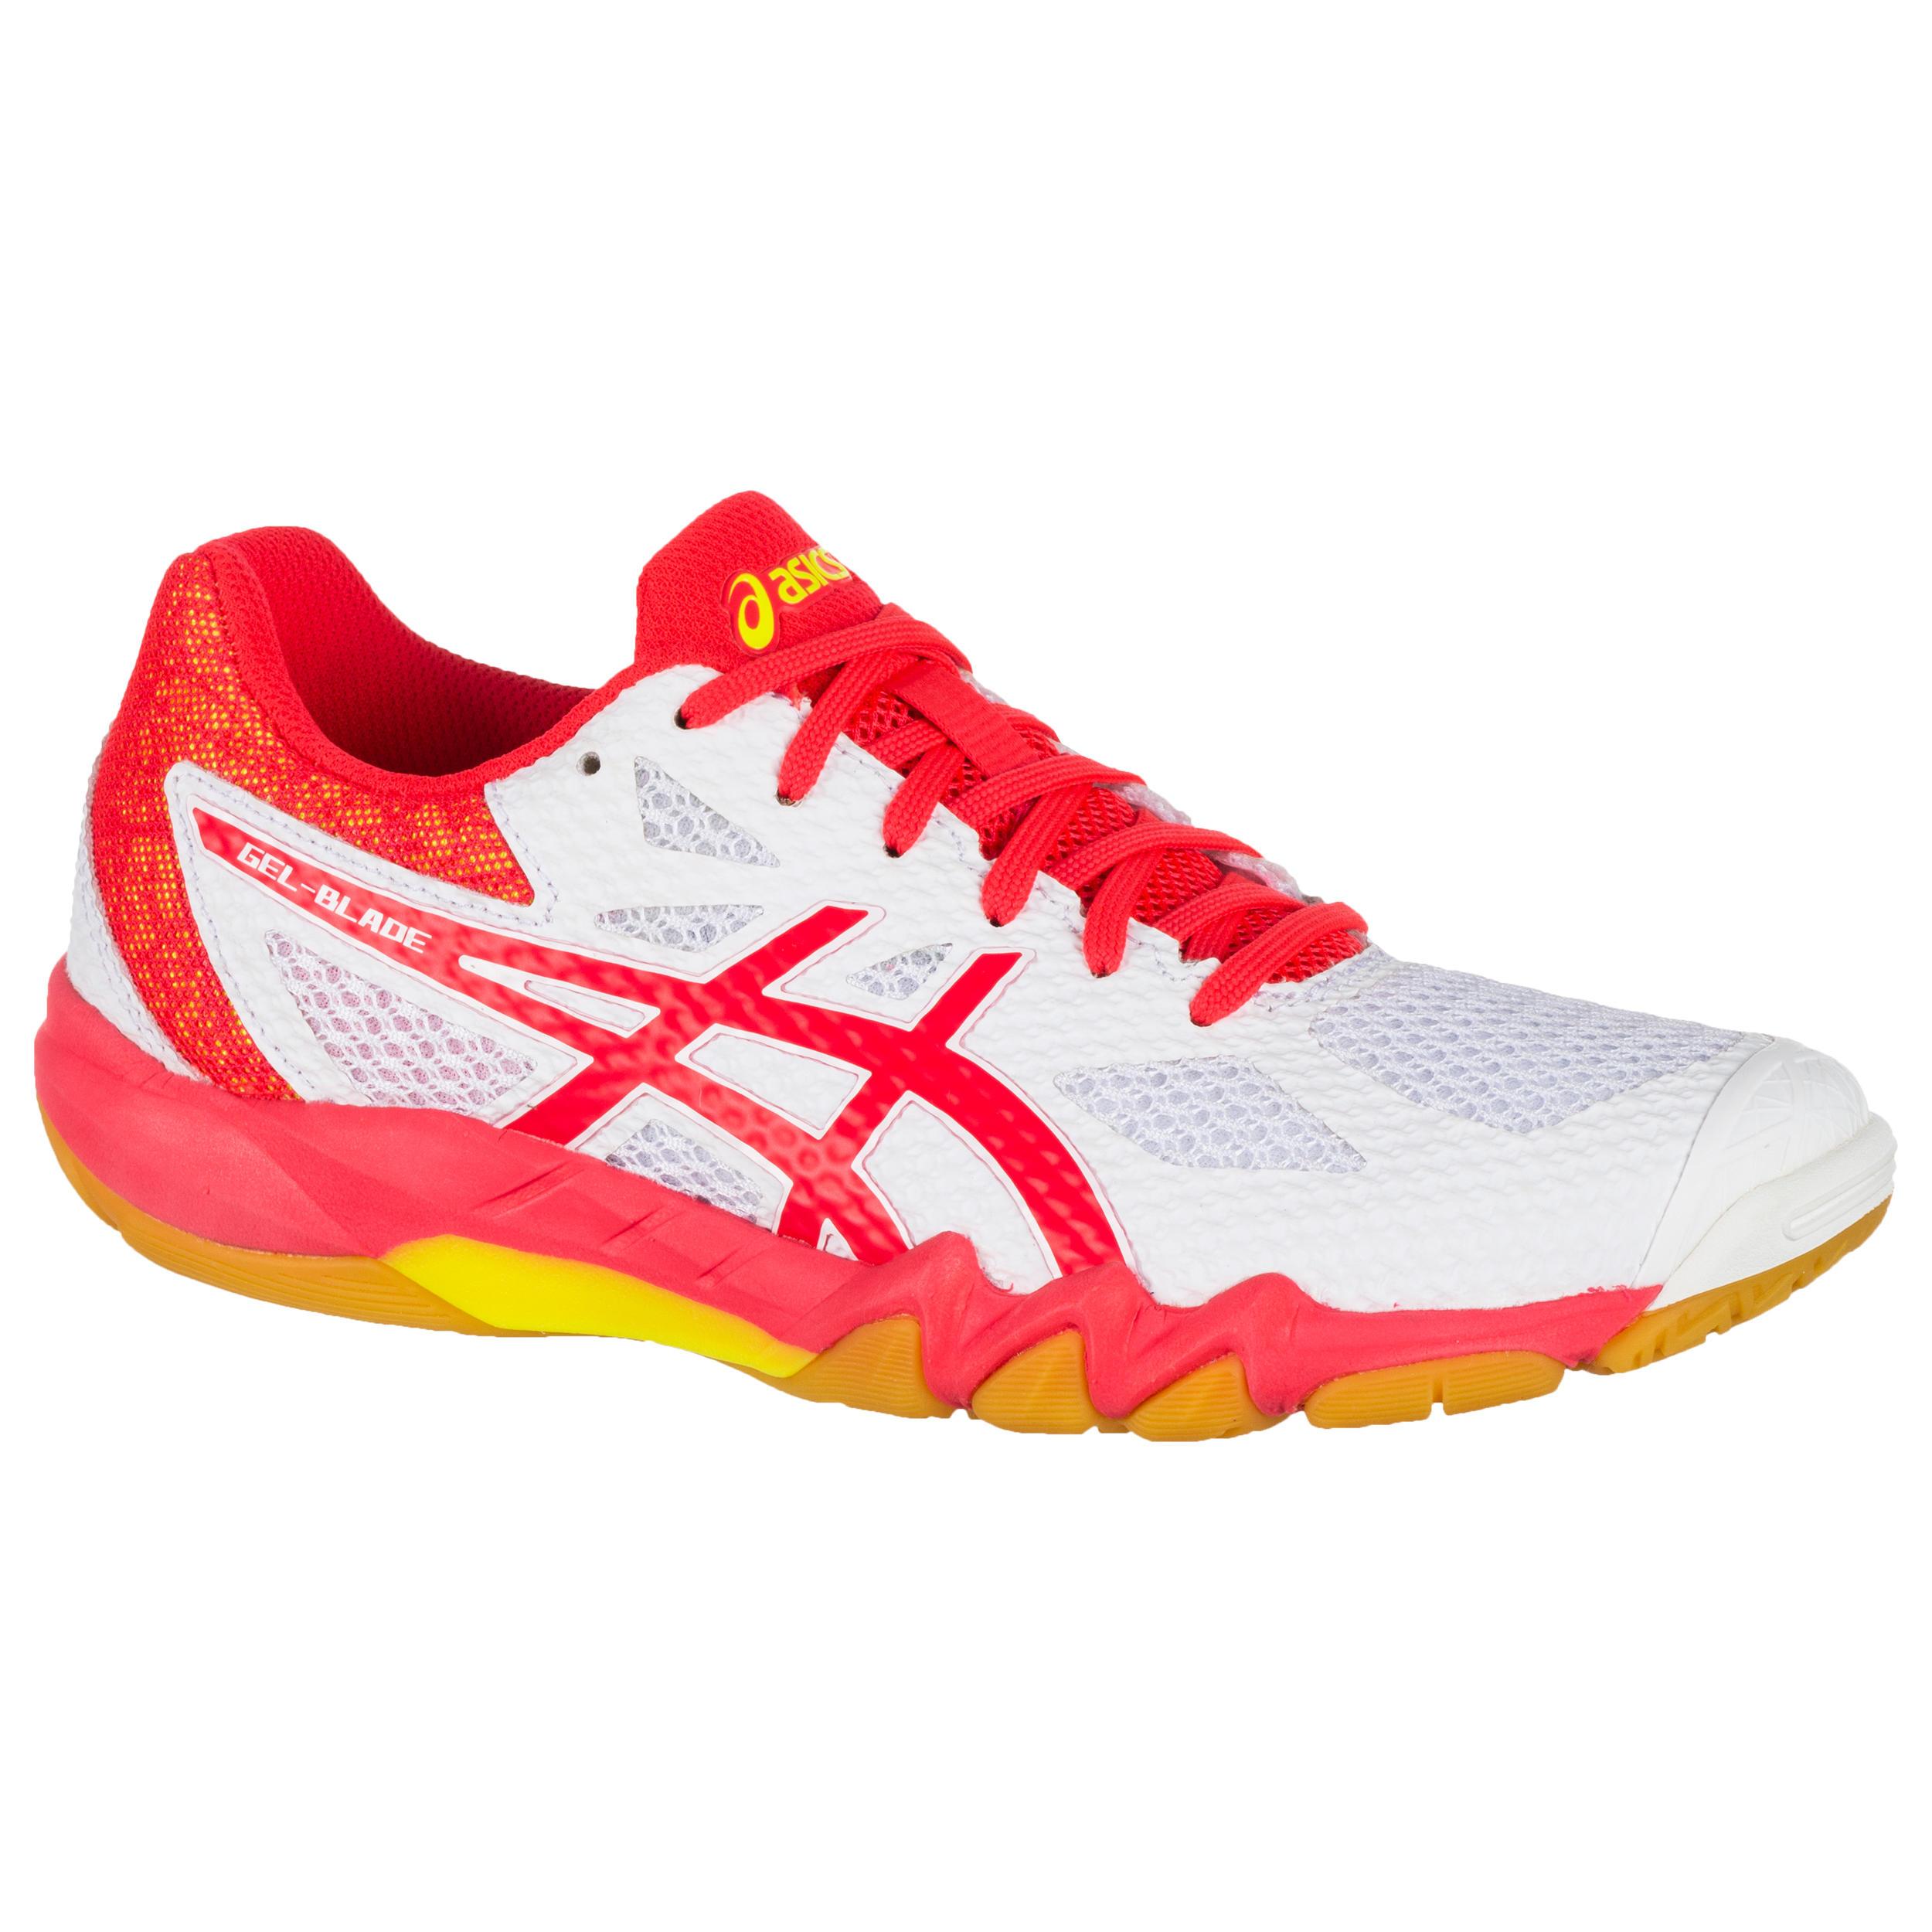 Squash Shoes Gel Blade ASICS